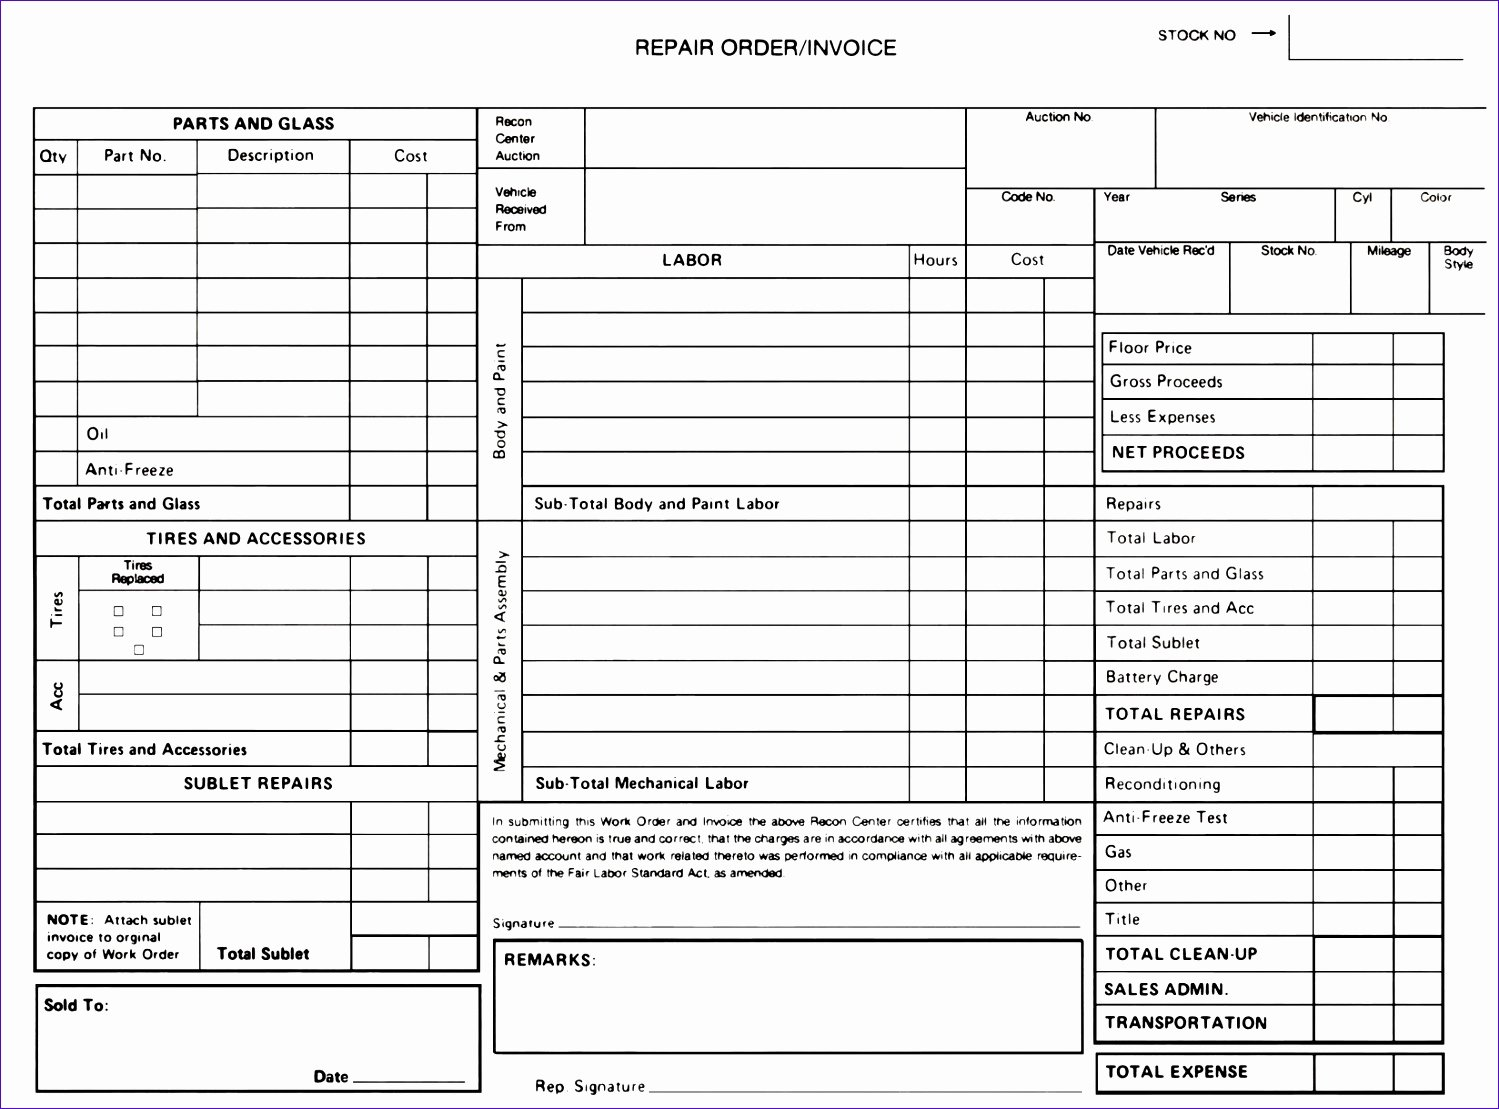 Auto Repair form Template Luxury 6 Auto Repair order Template Excel Exceltemplates